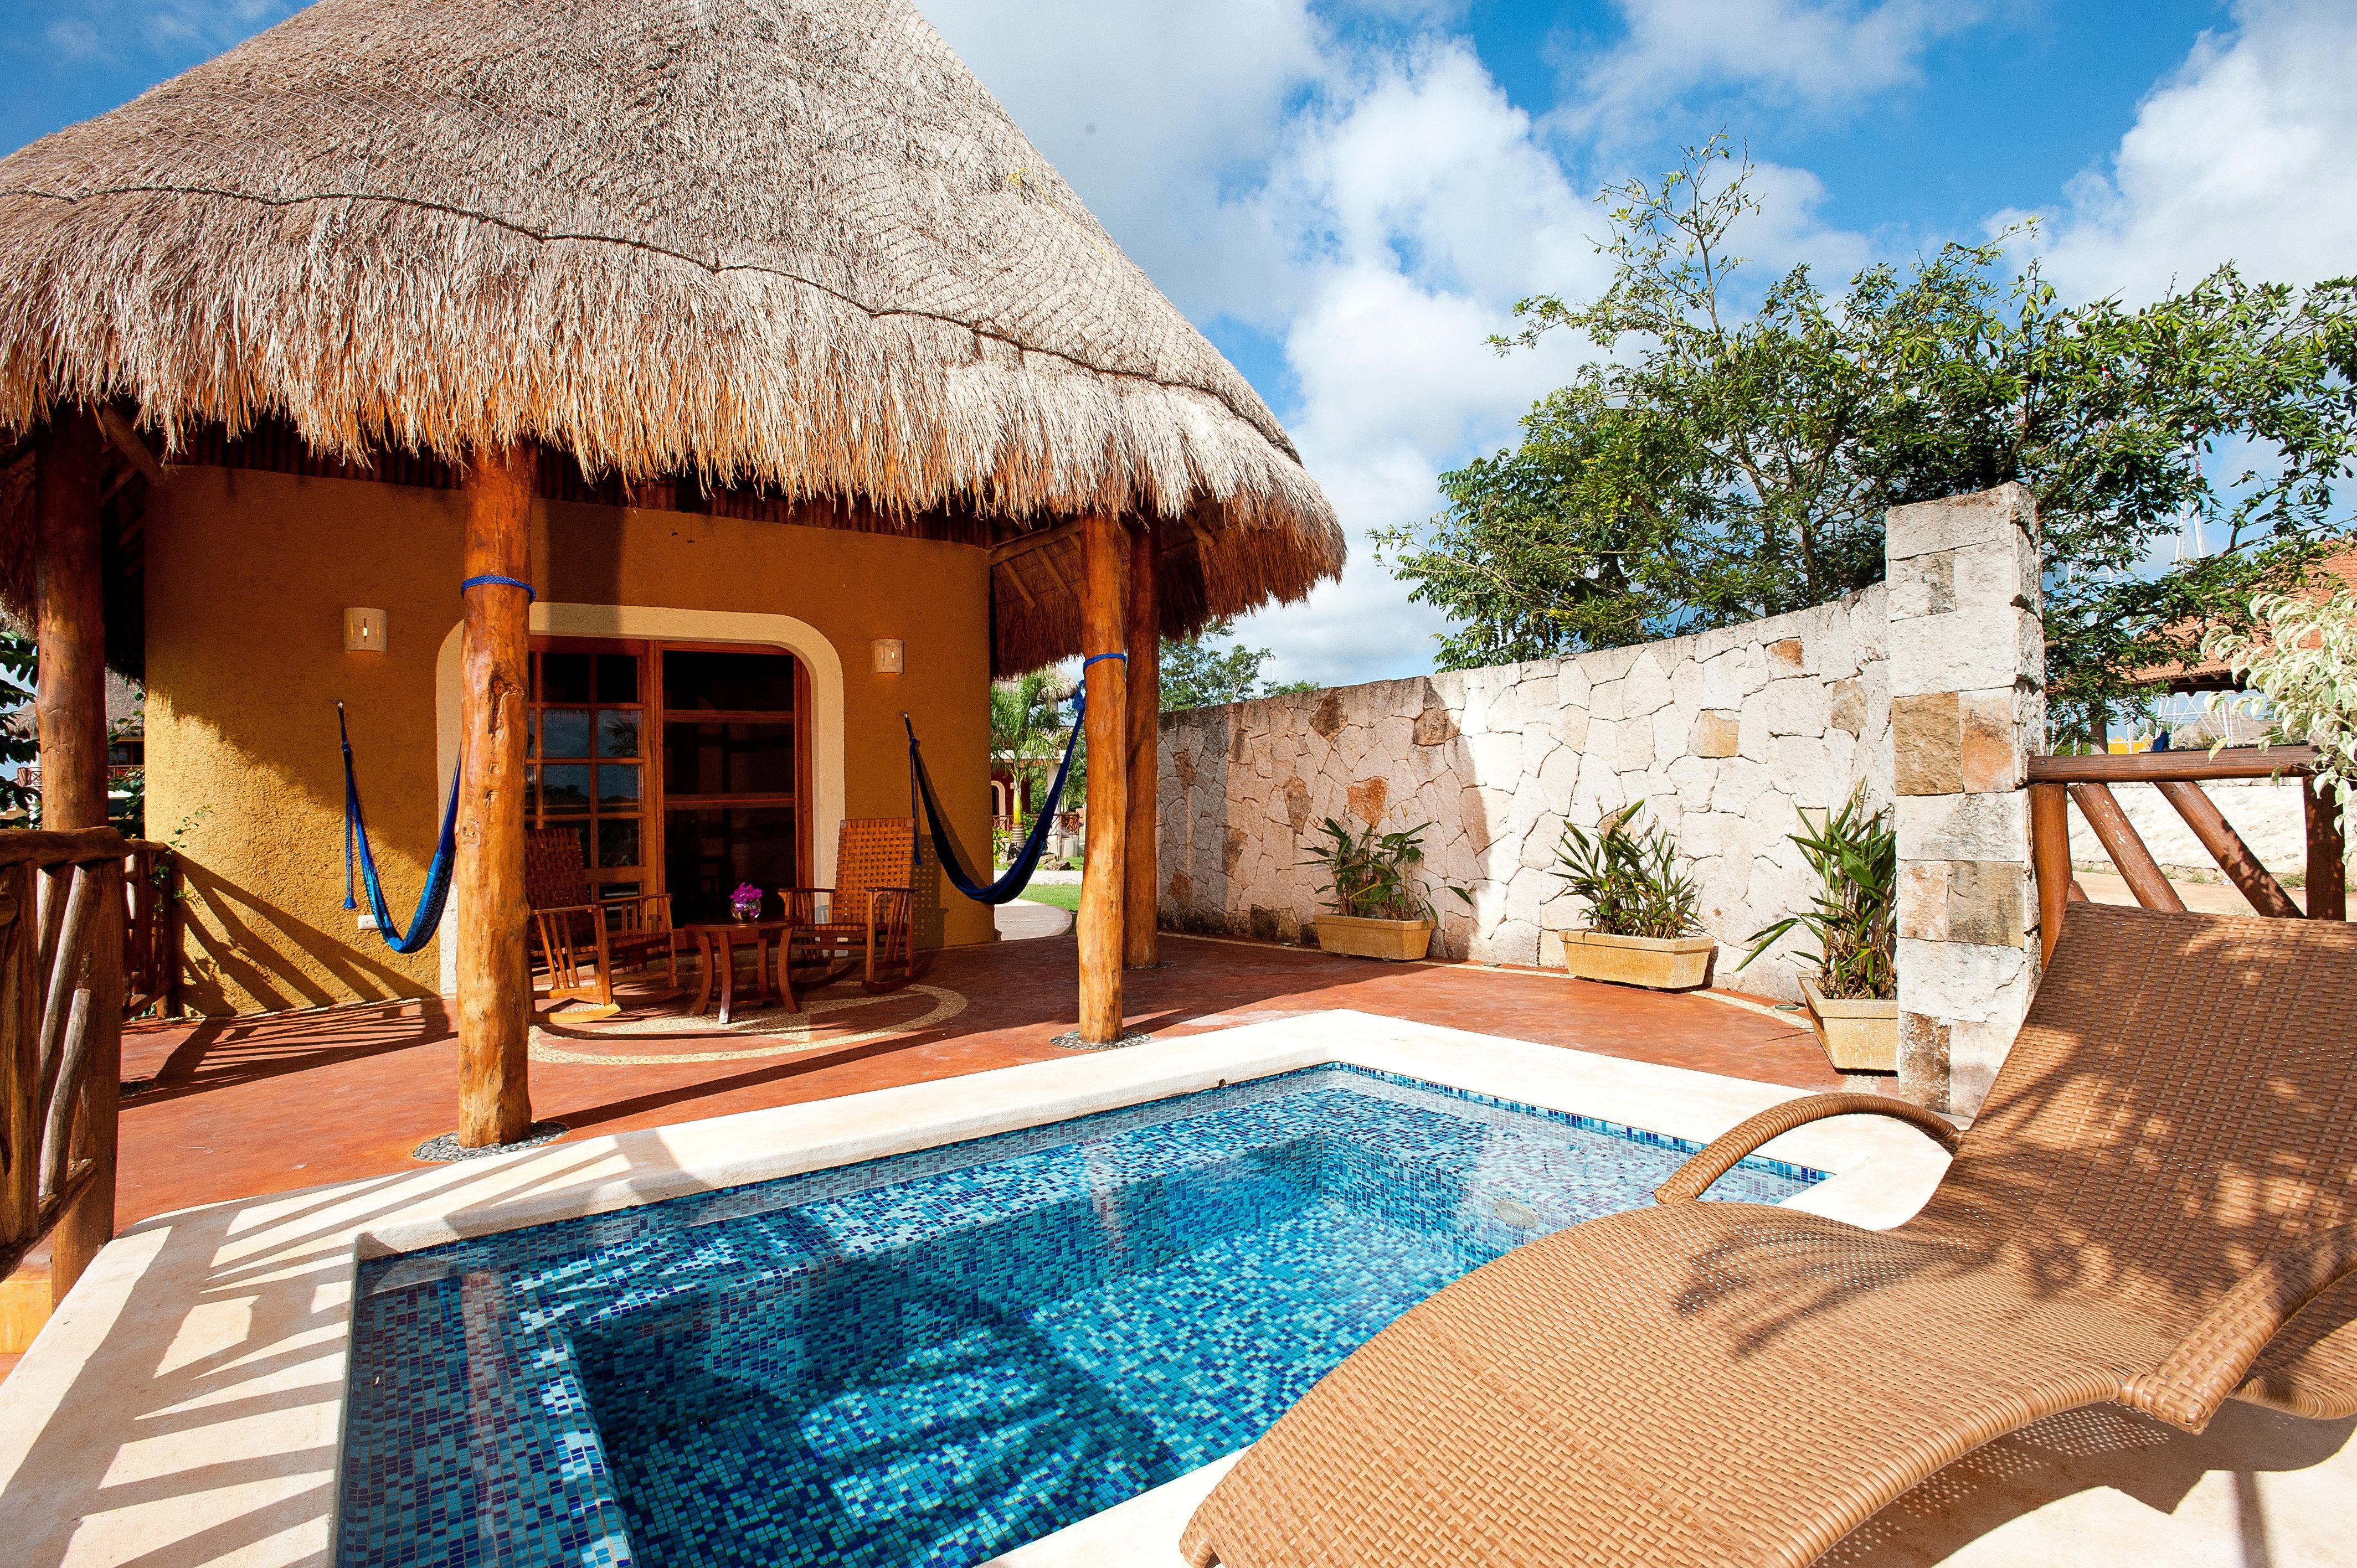 Drink Lounge Luxury Pool swimming pool property leisure building Resort Villa house home cottage backyard hacienda mansion roof